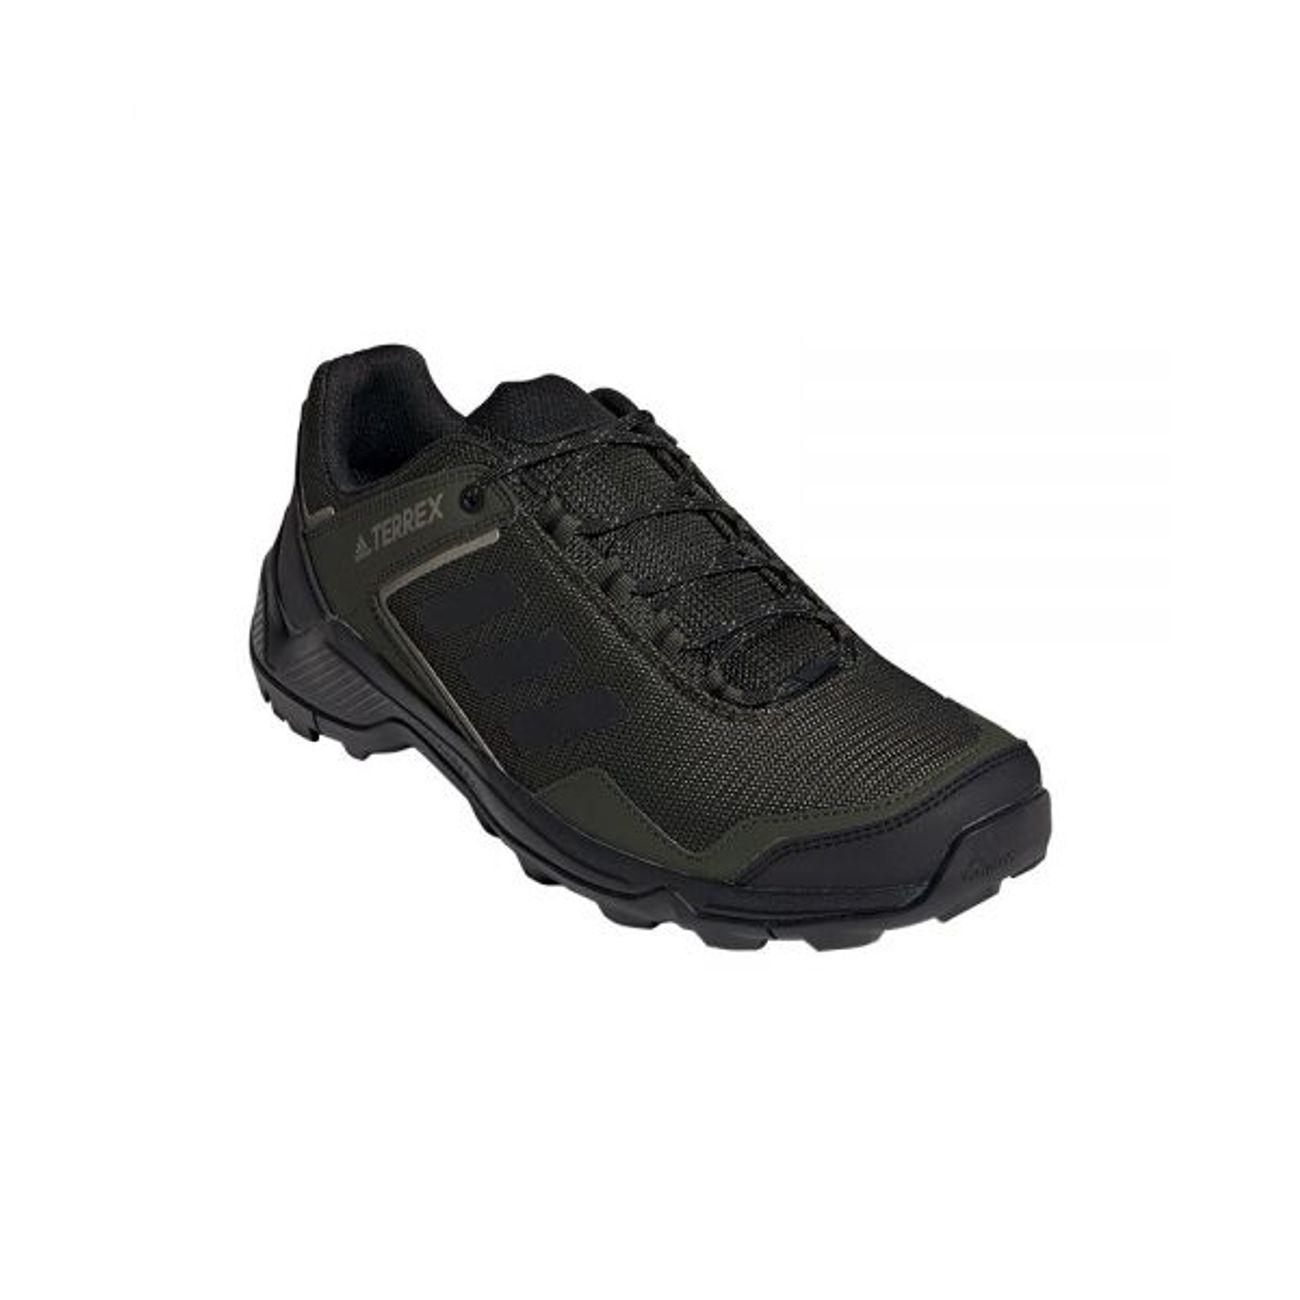 Vert Running Adidas Adulte Noir Bc0974 Eastrail Terrex FJcl1TK